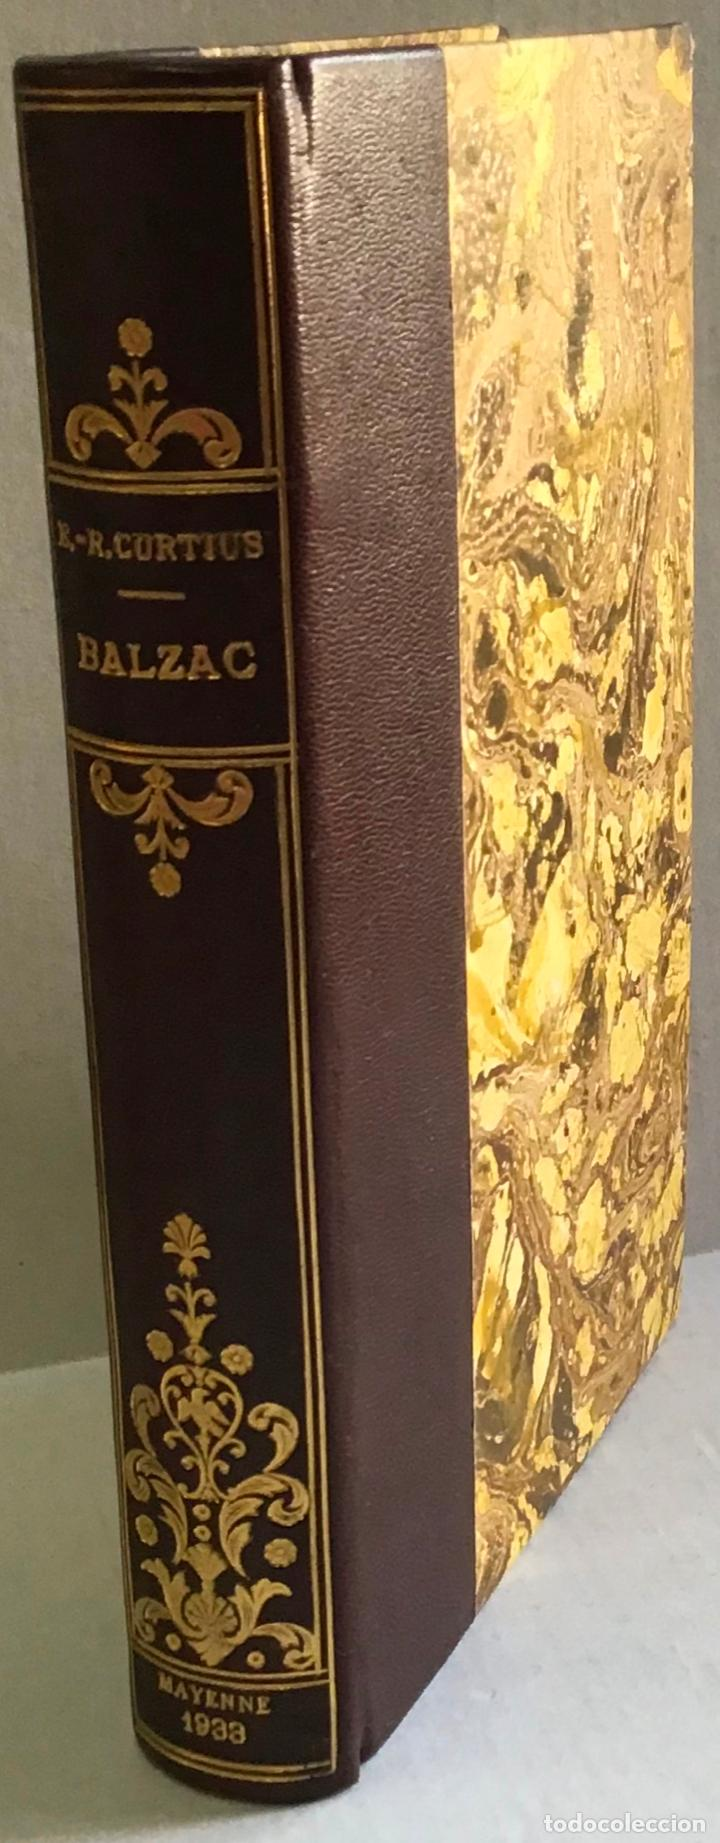 Libros antiguos: BALZAC. - ROBERT CURTIUS, Ernst. - Foto 2 - 123238124